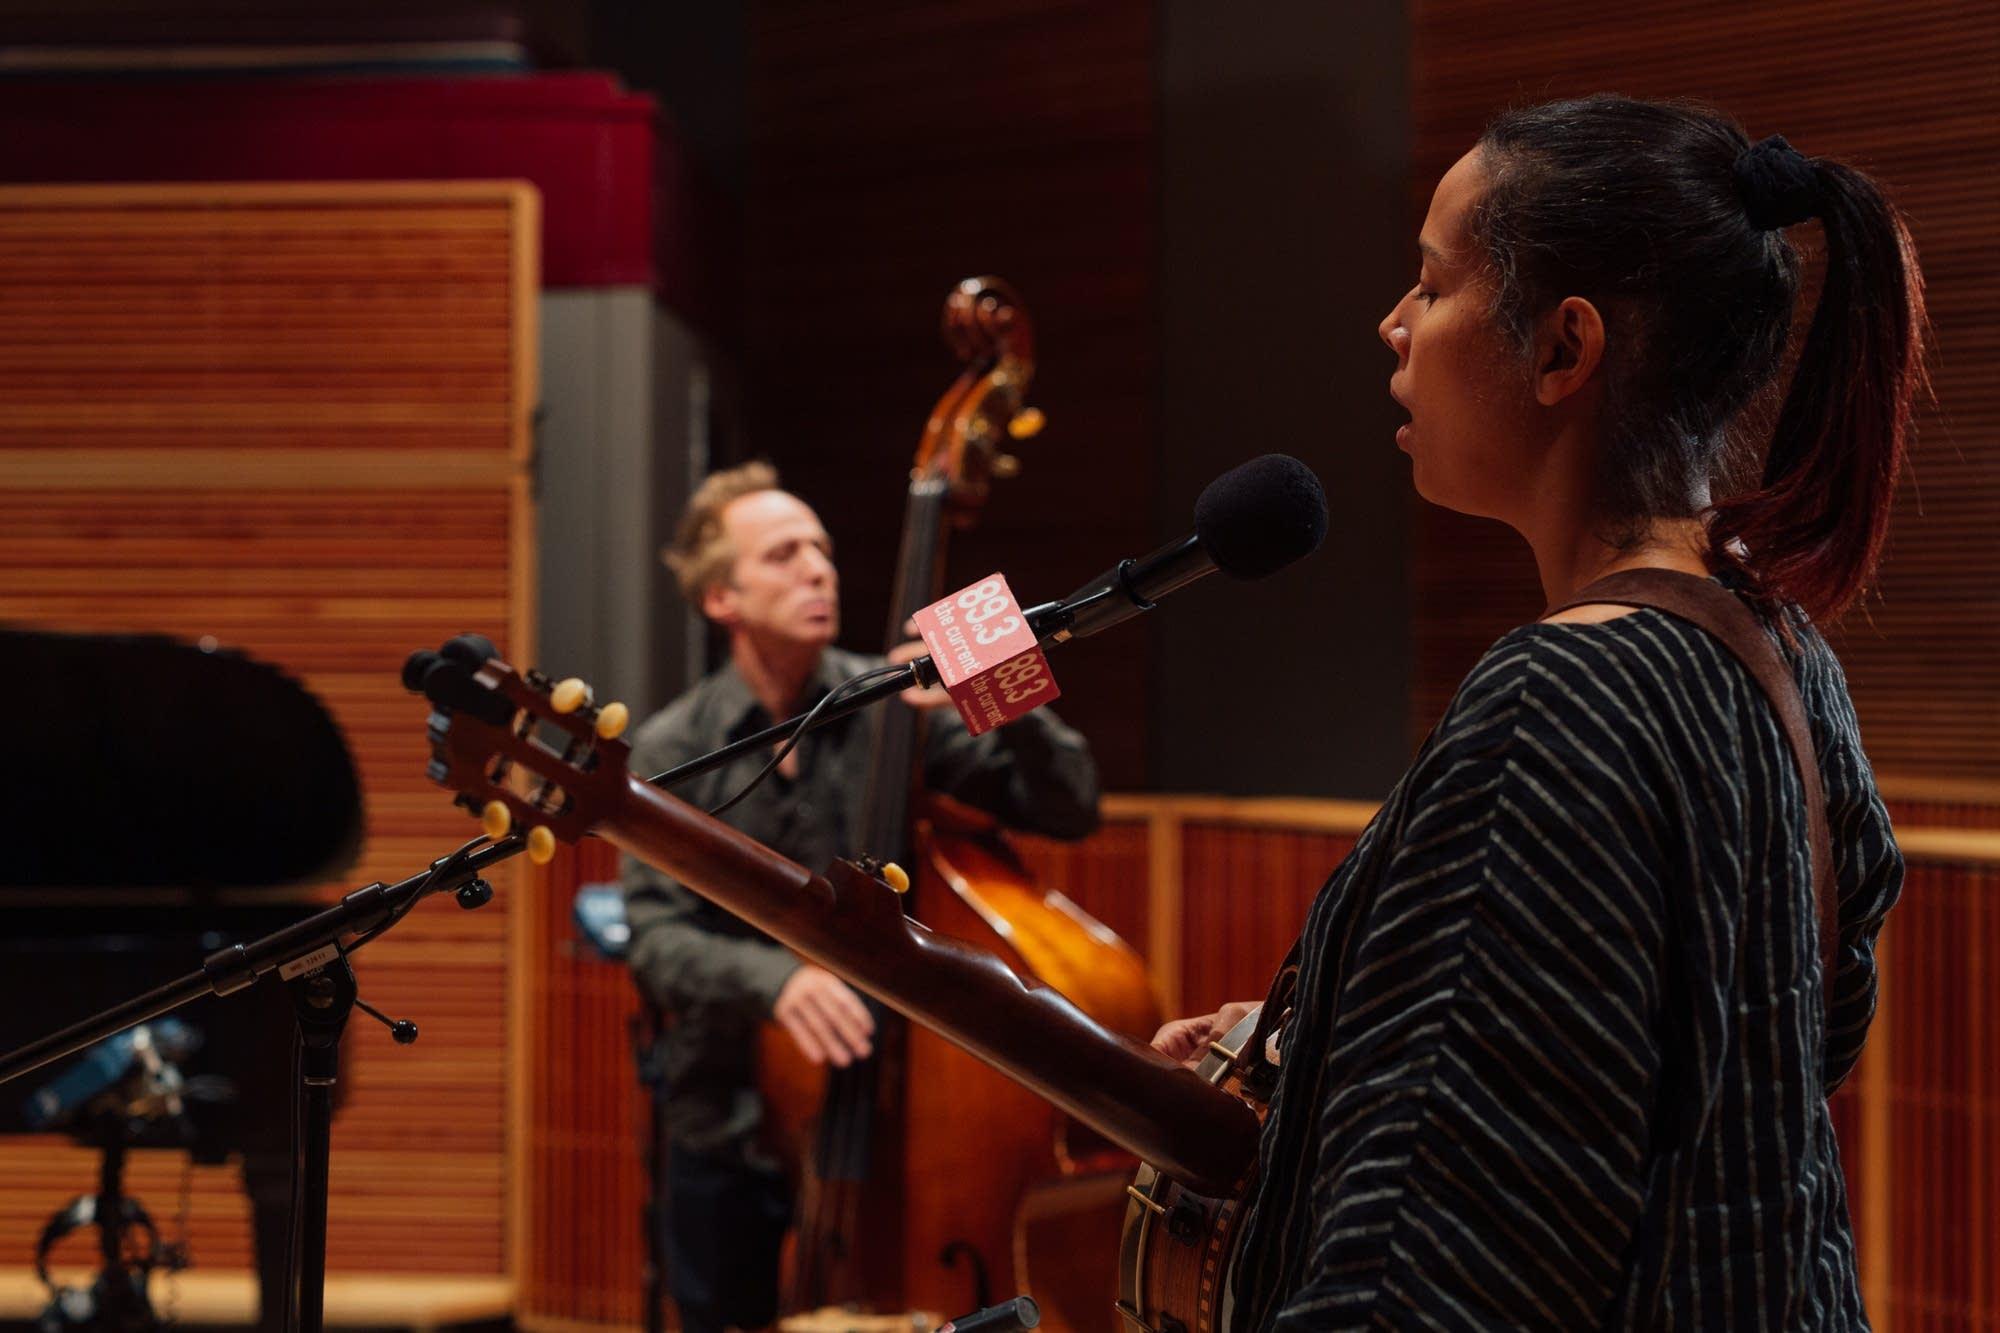 Rhiannon Giddens in The Current studio